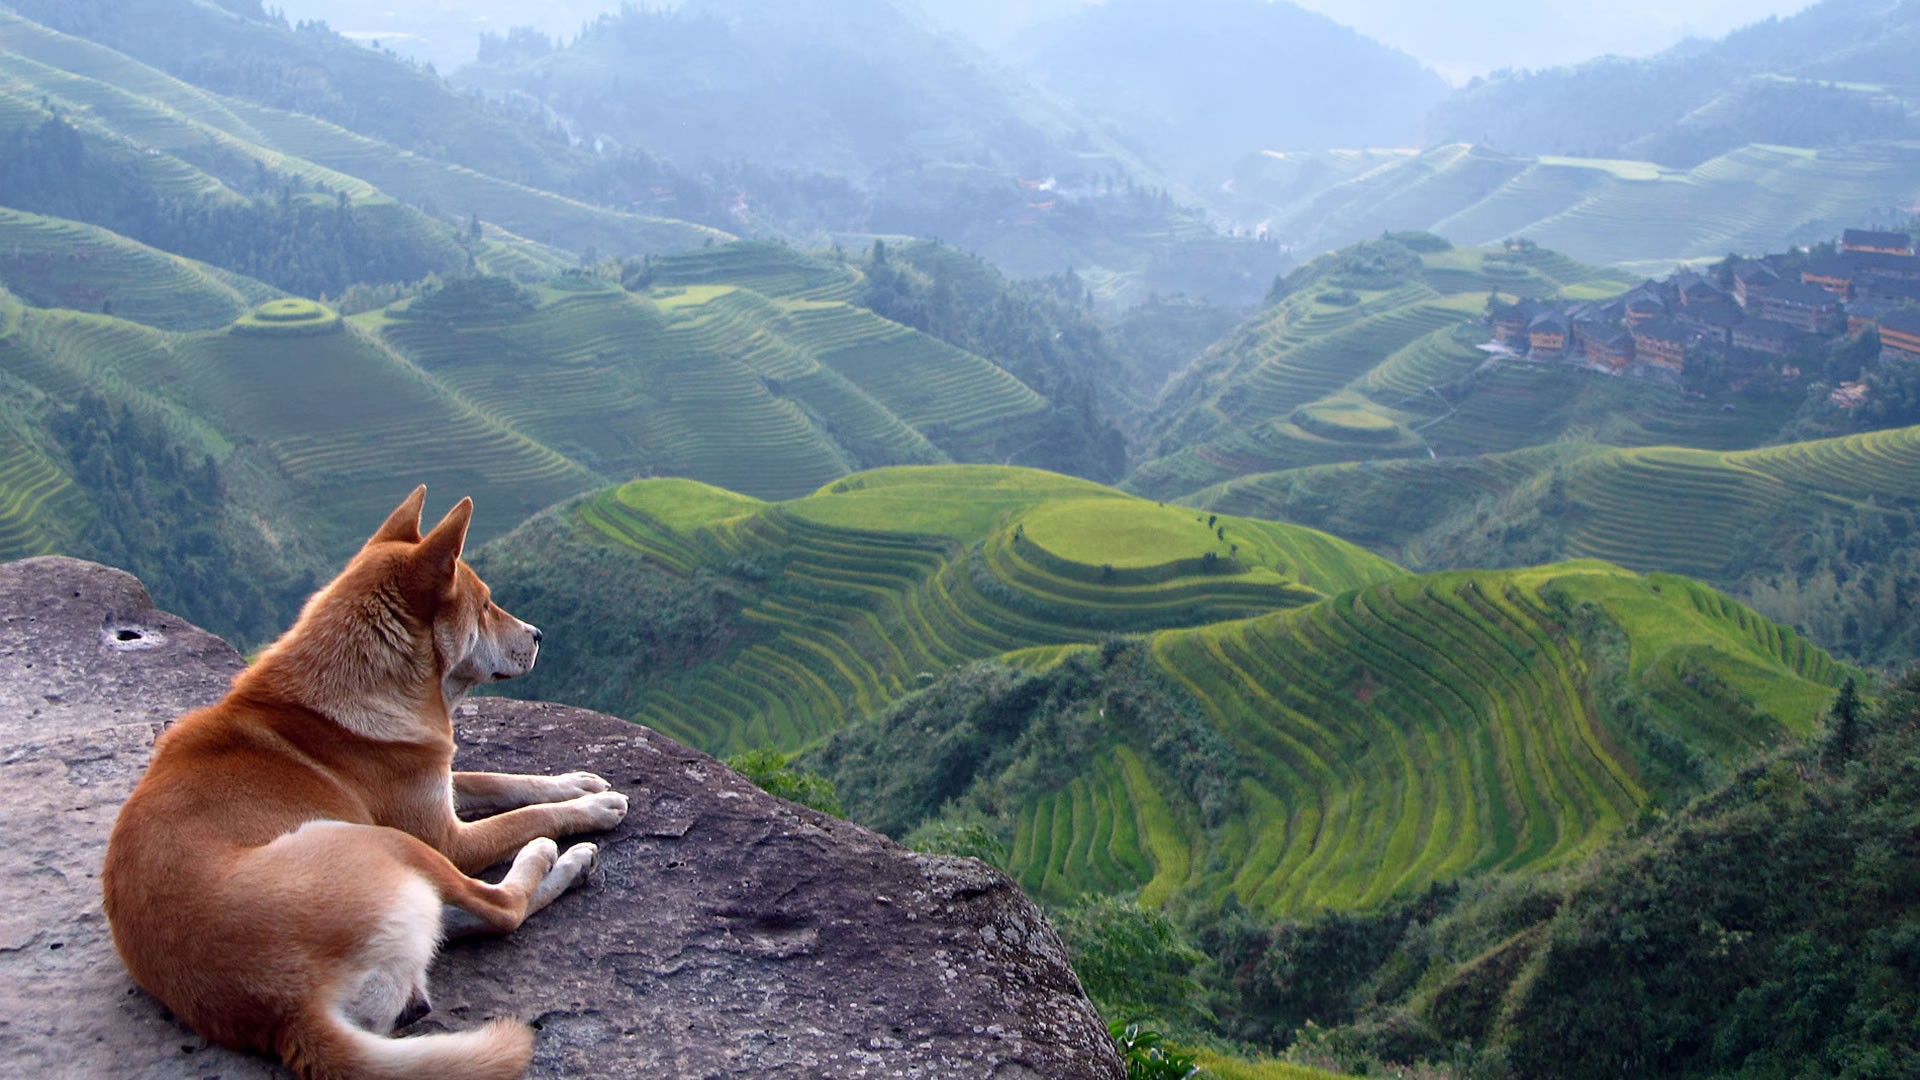 General 1920x1080 dog landscape outdoors animals mammals